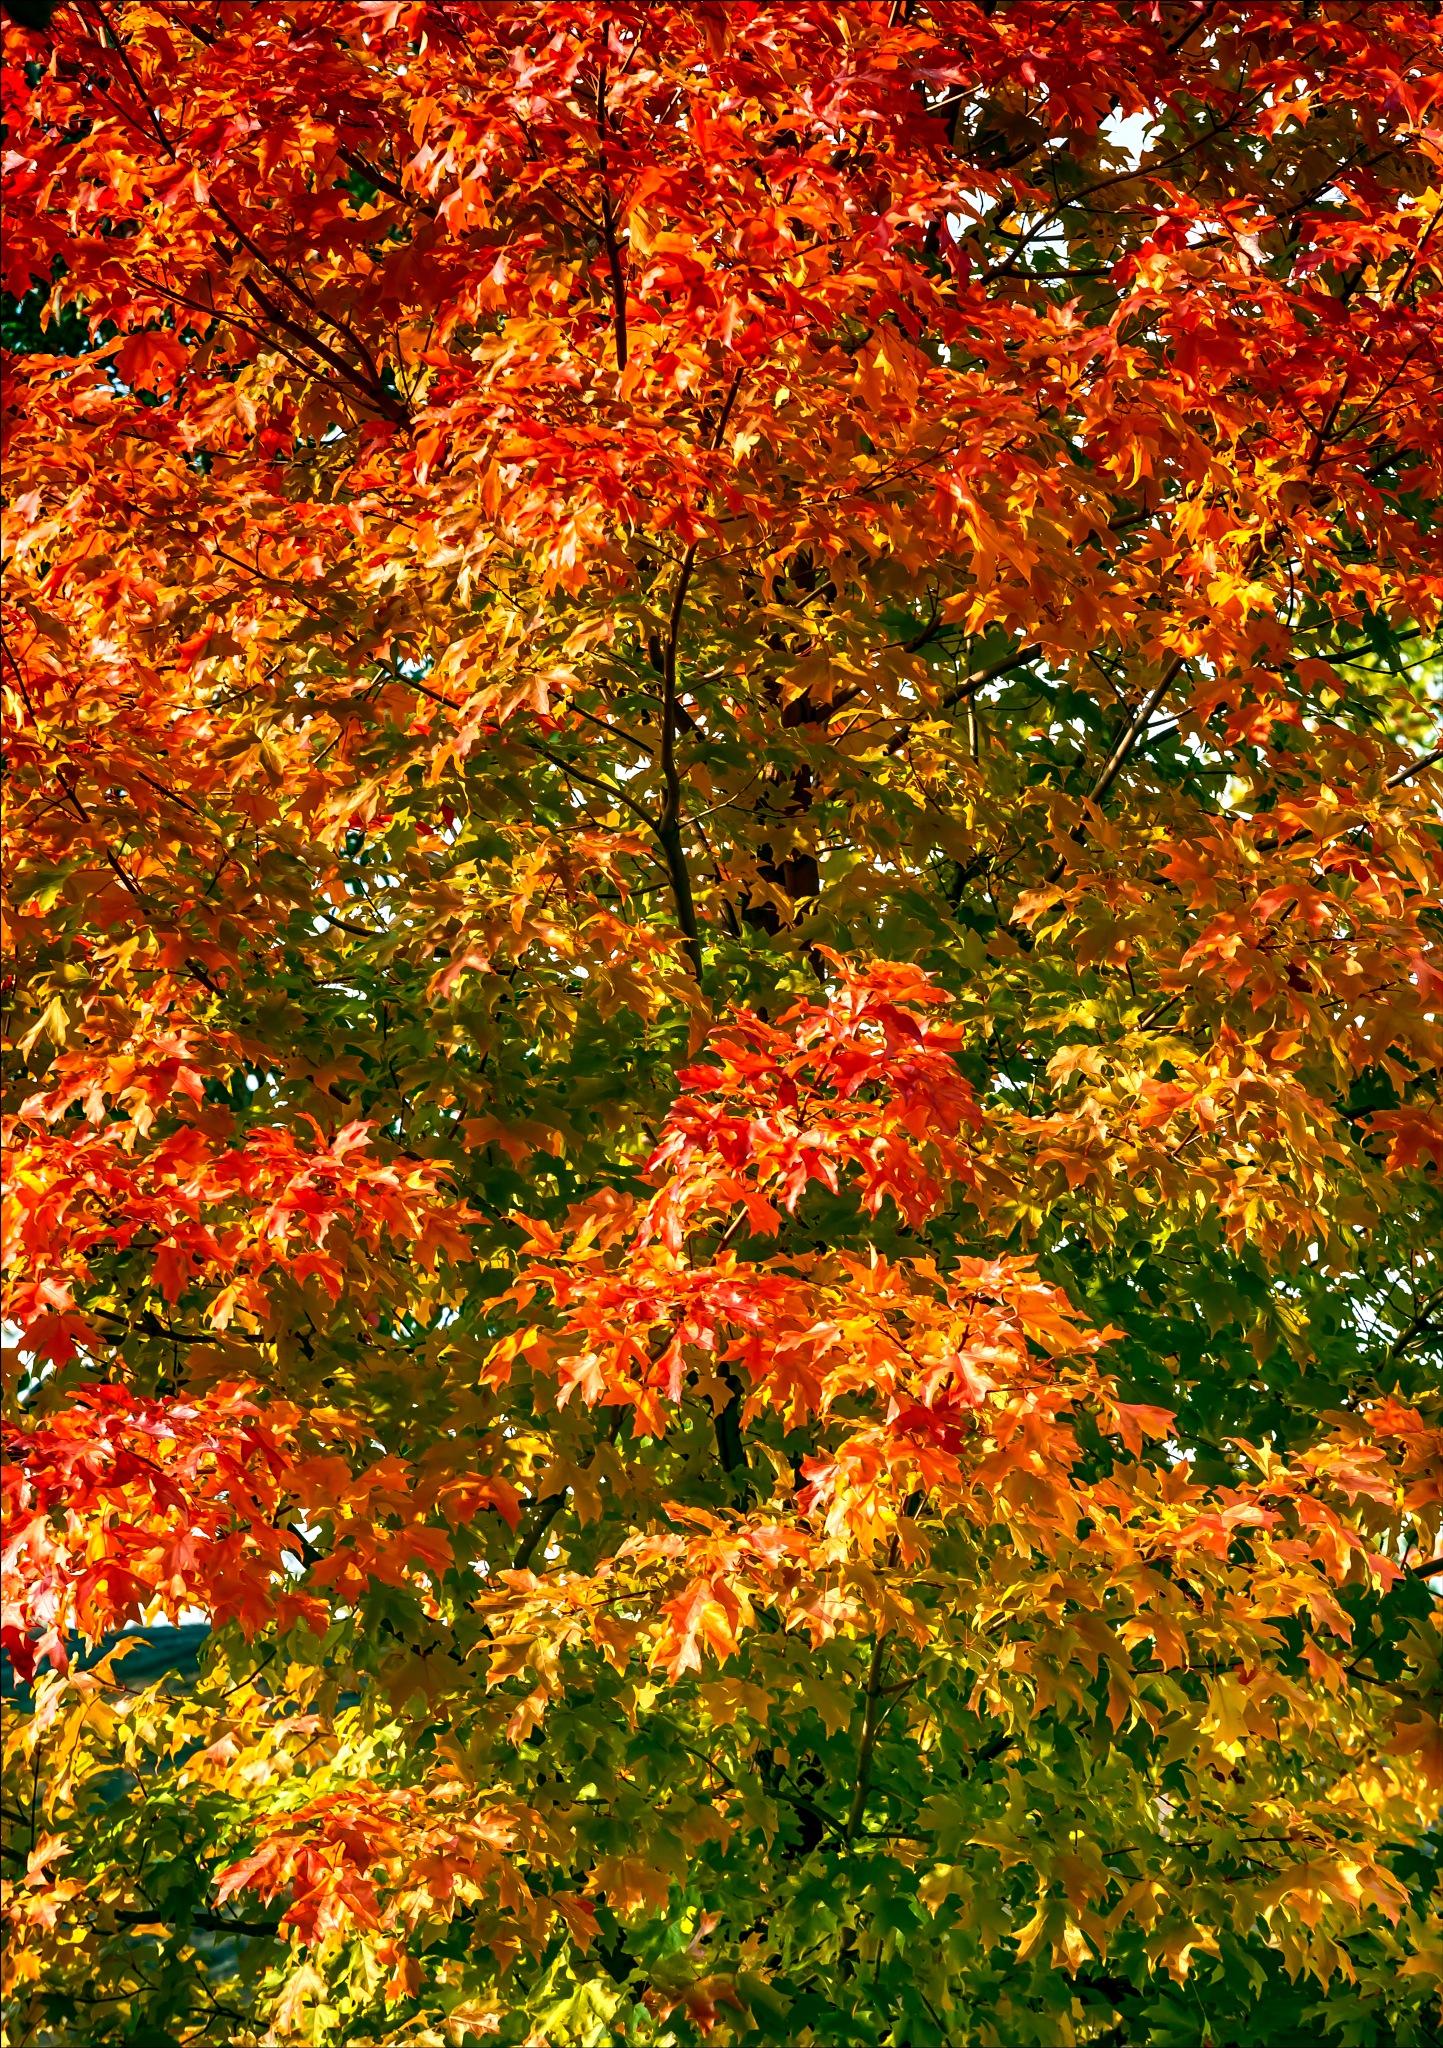 Fall Leaves by robertullmann